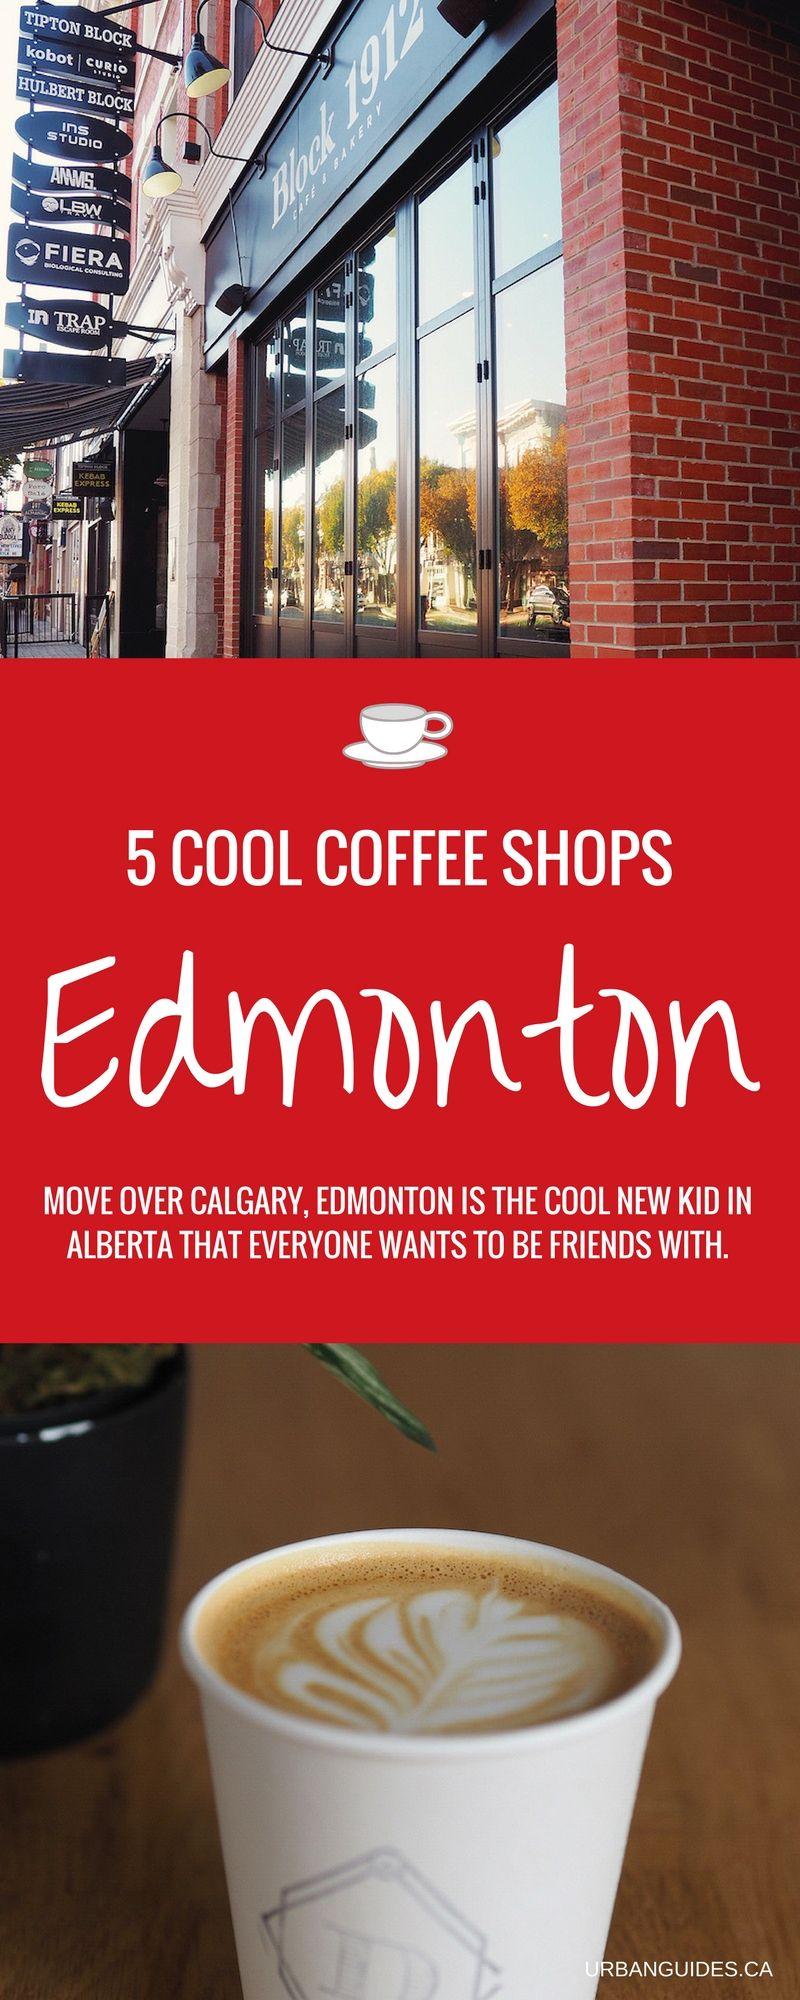 5 Cool Coffee Shops in Edmonton Alberta Alberta canada